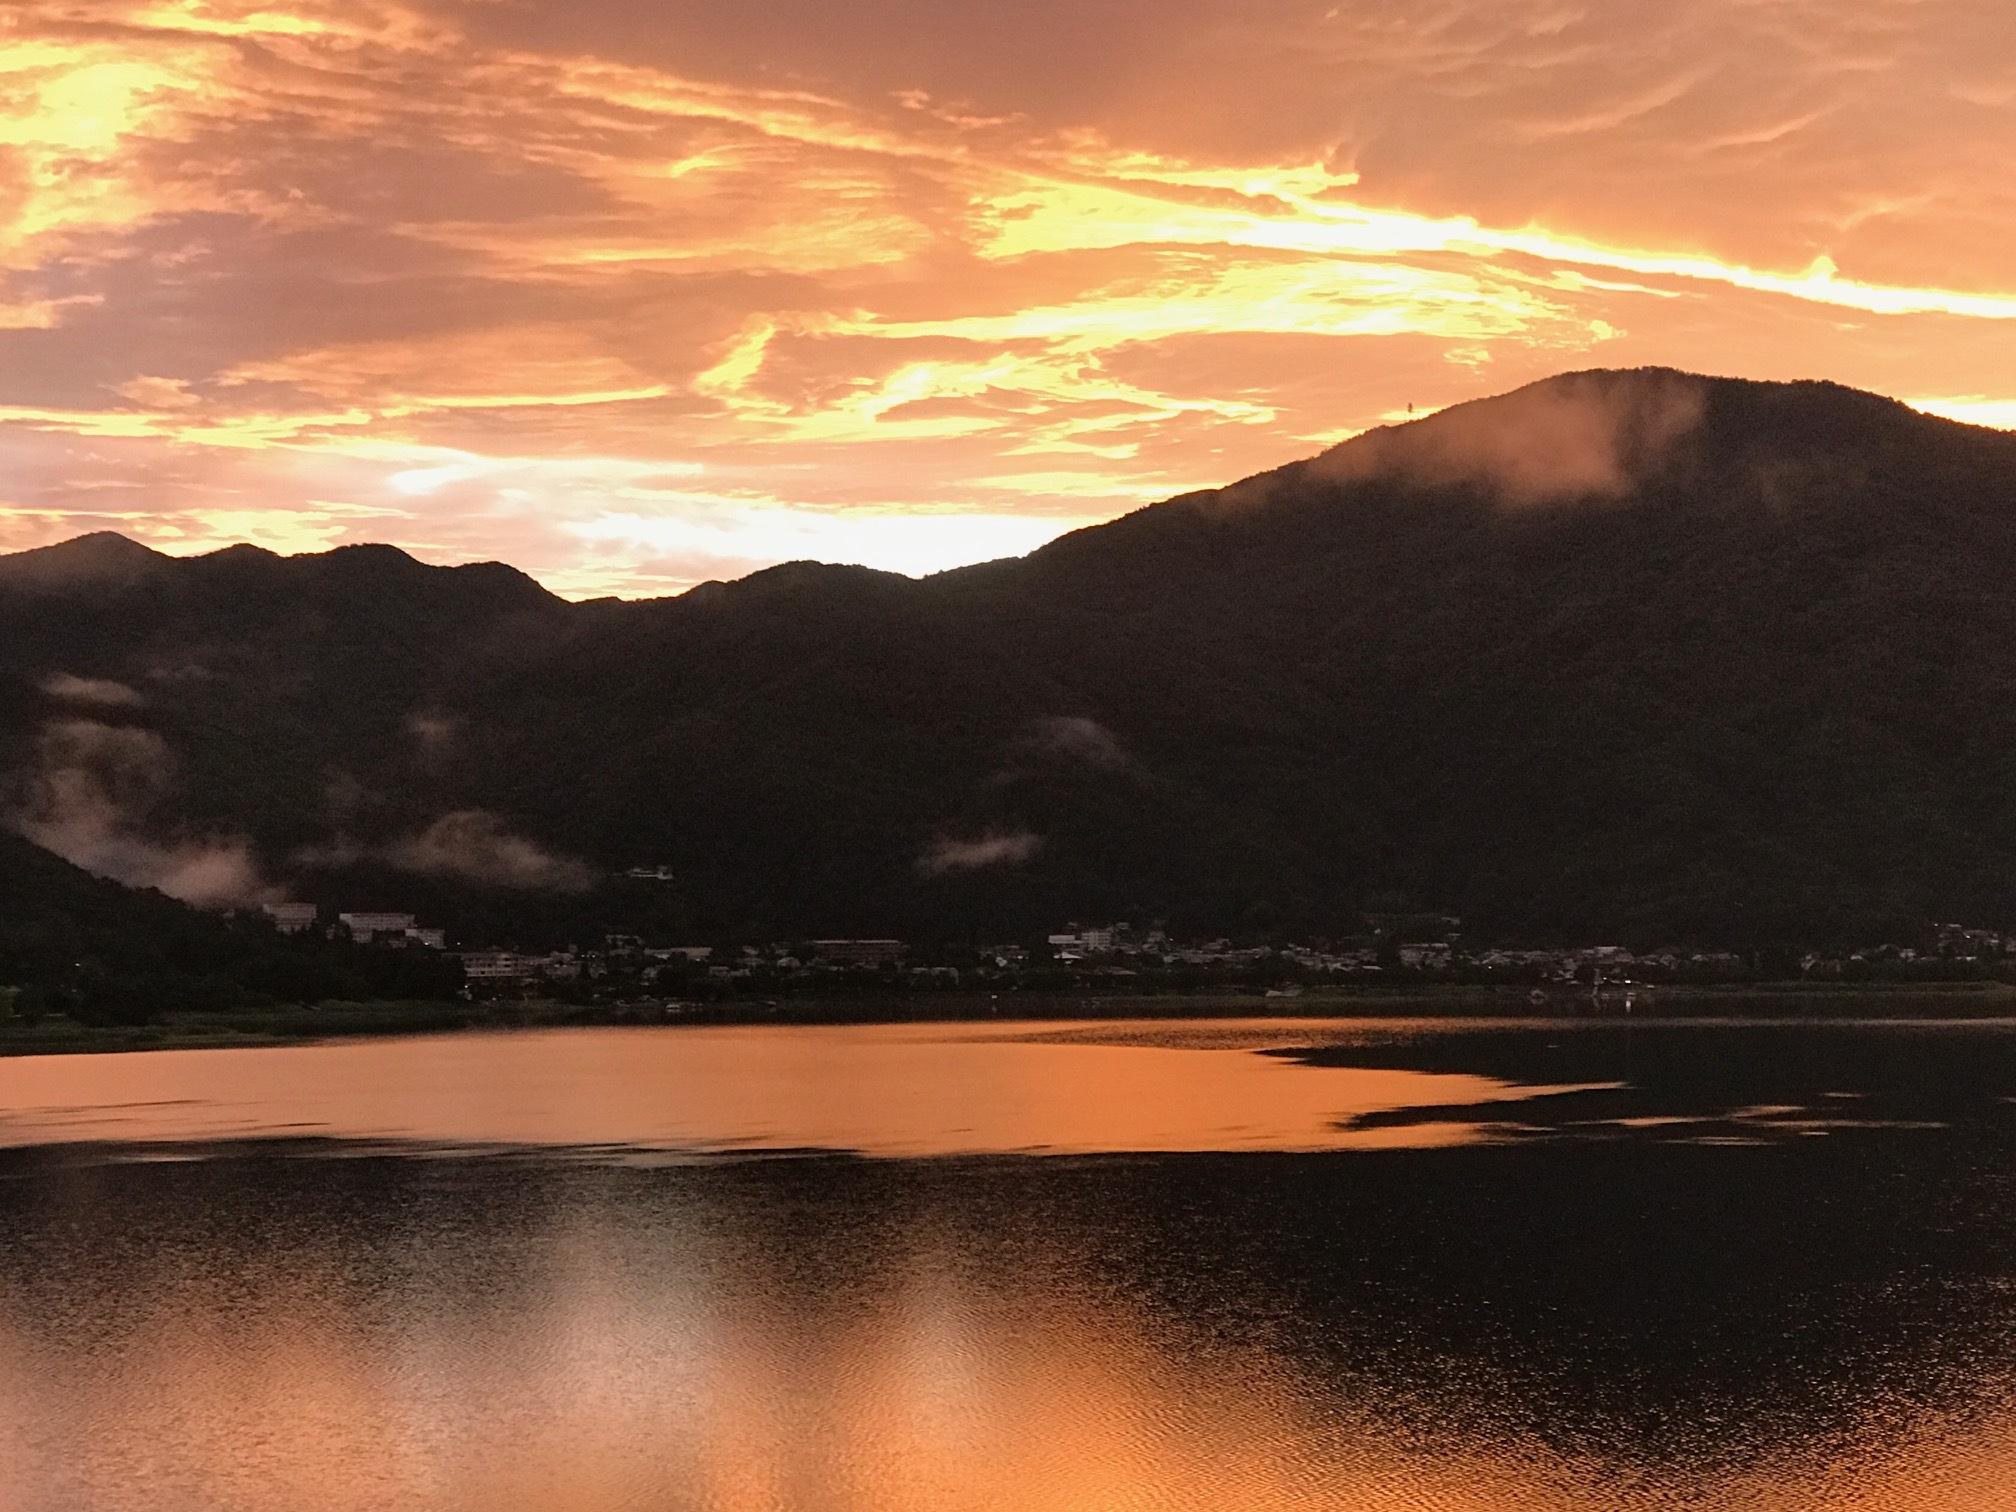 Sunrise at the Ryokan